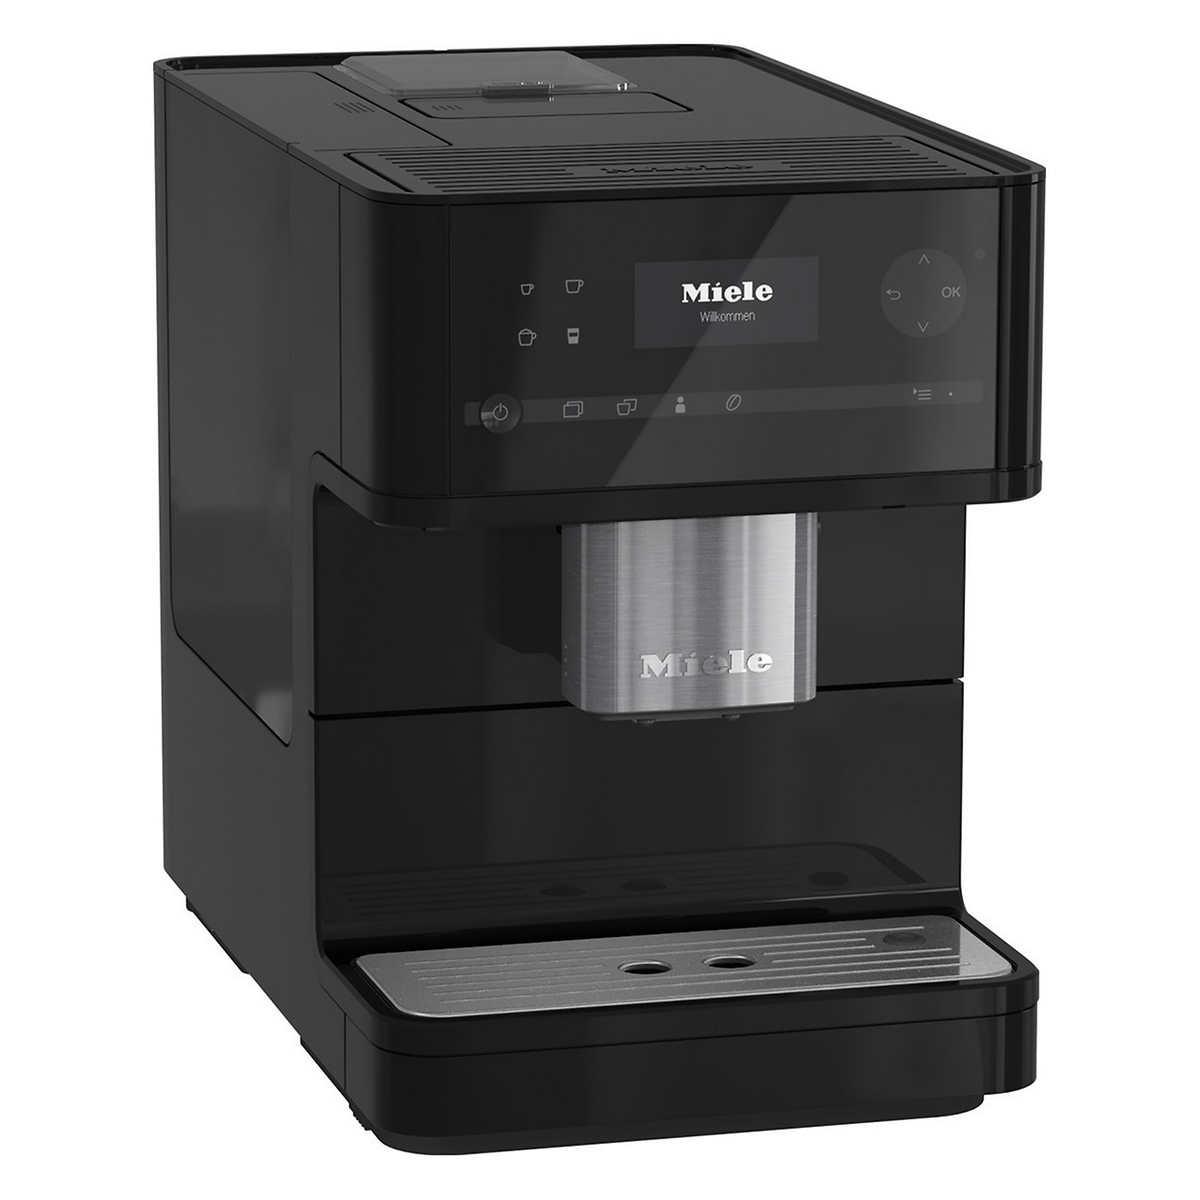 Miele CM6150 OBSW Super Automatic Espresso Machine - Obsidian Black 29615020CDN